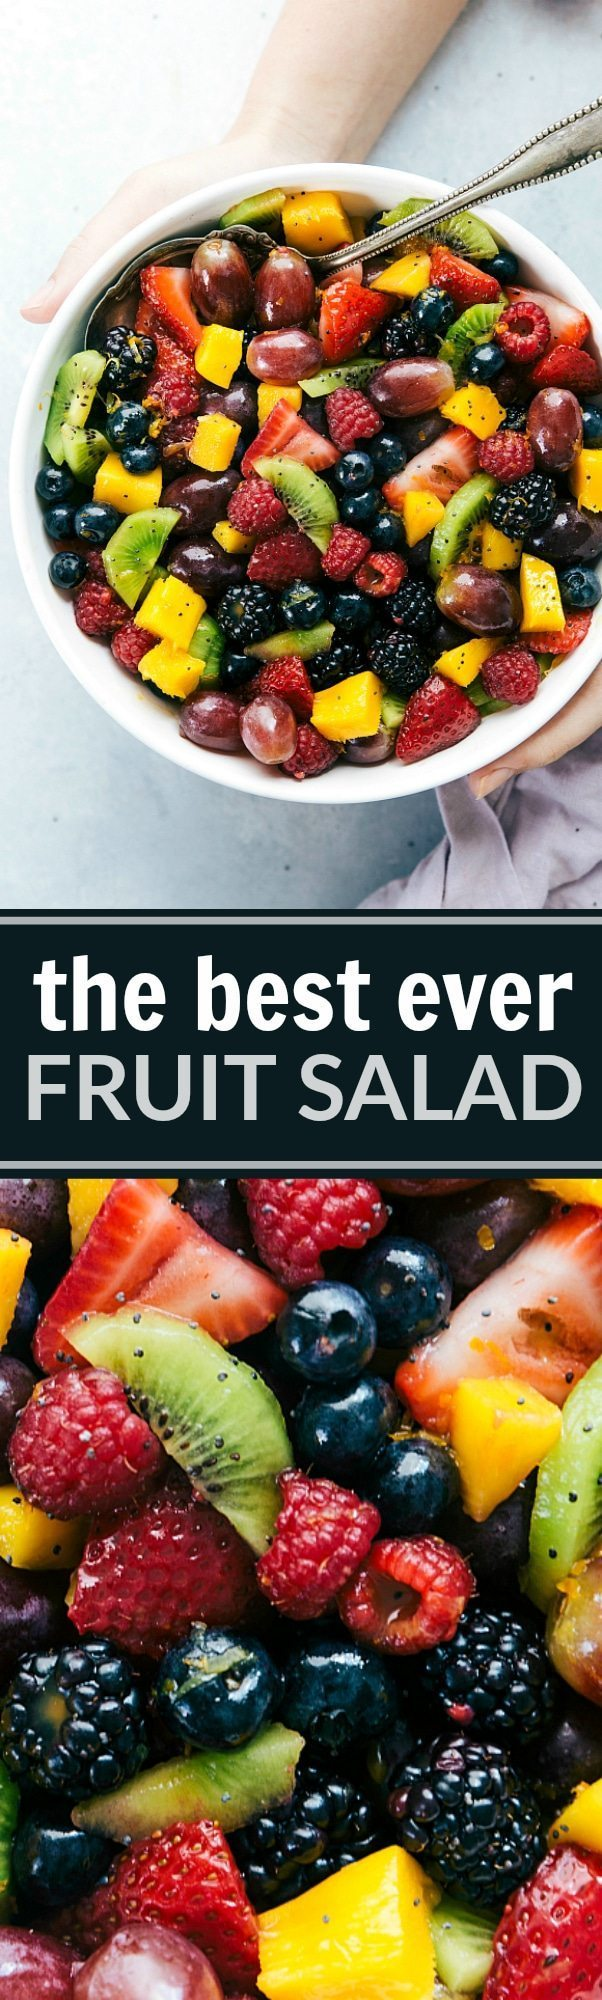 The ultimate BEST EVER FRUIT SALAD! via chelseasmessyapron.com